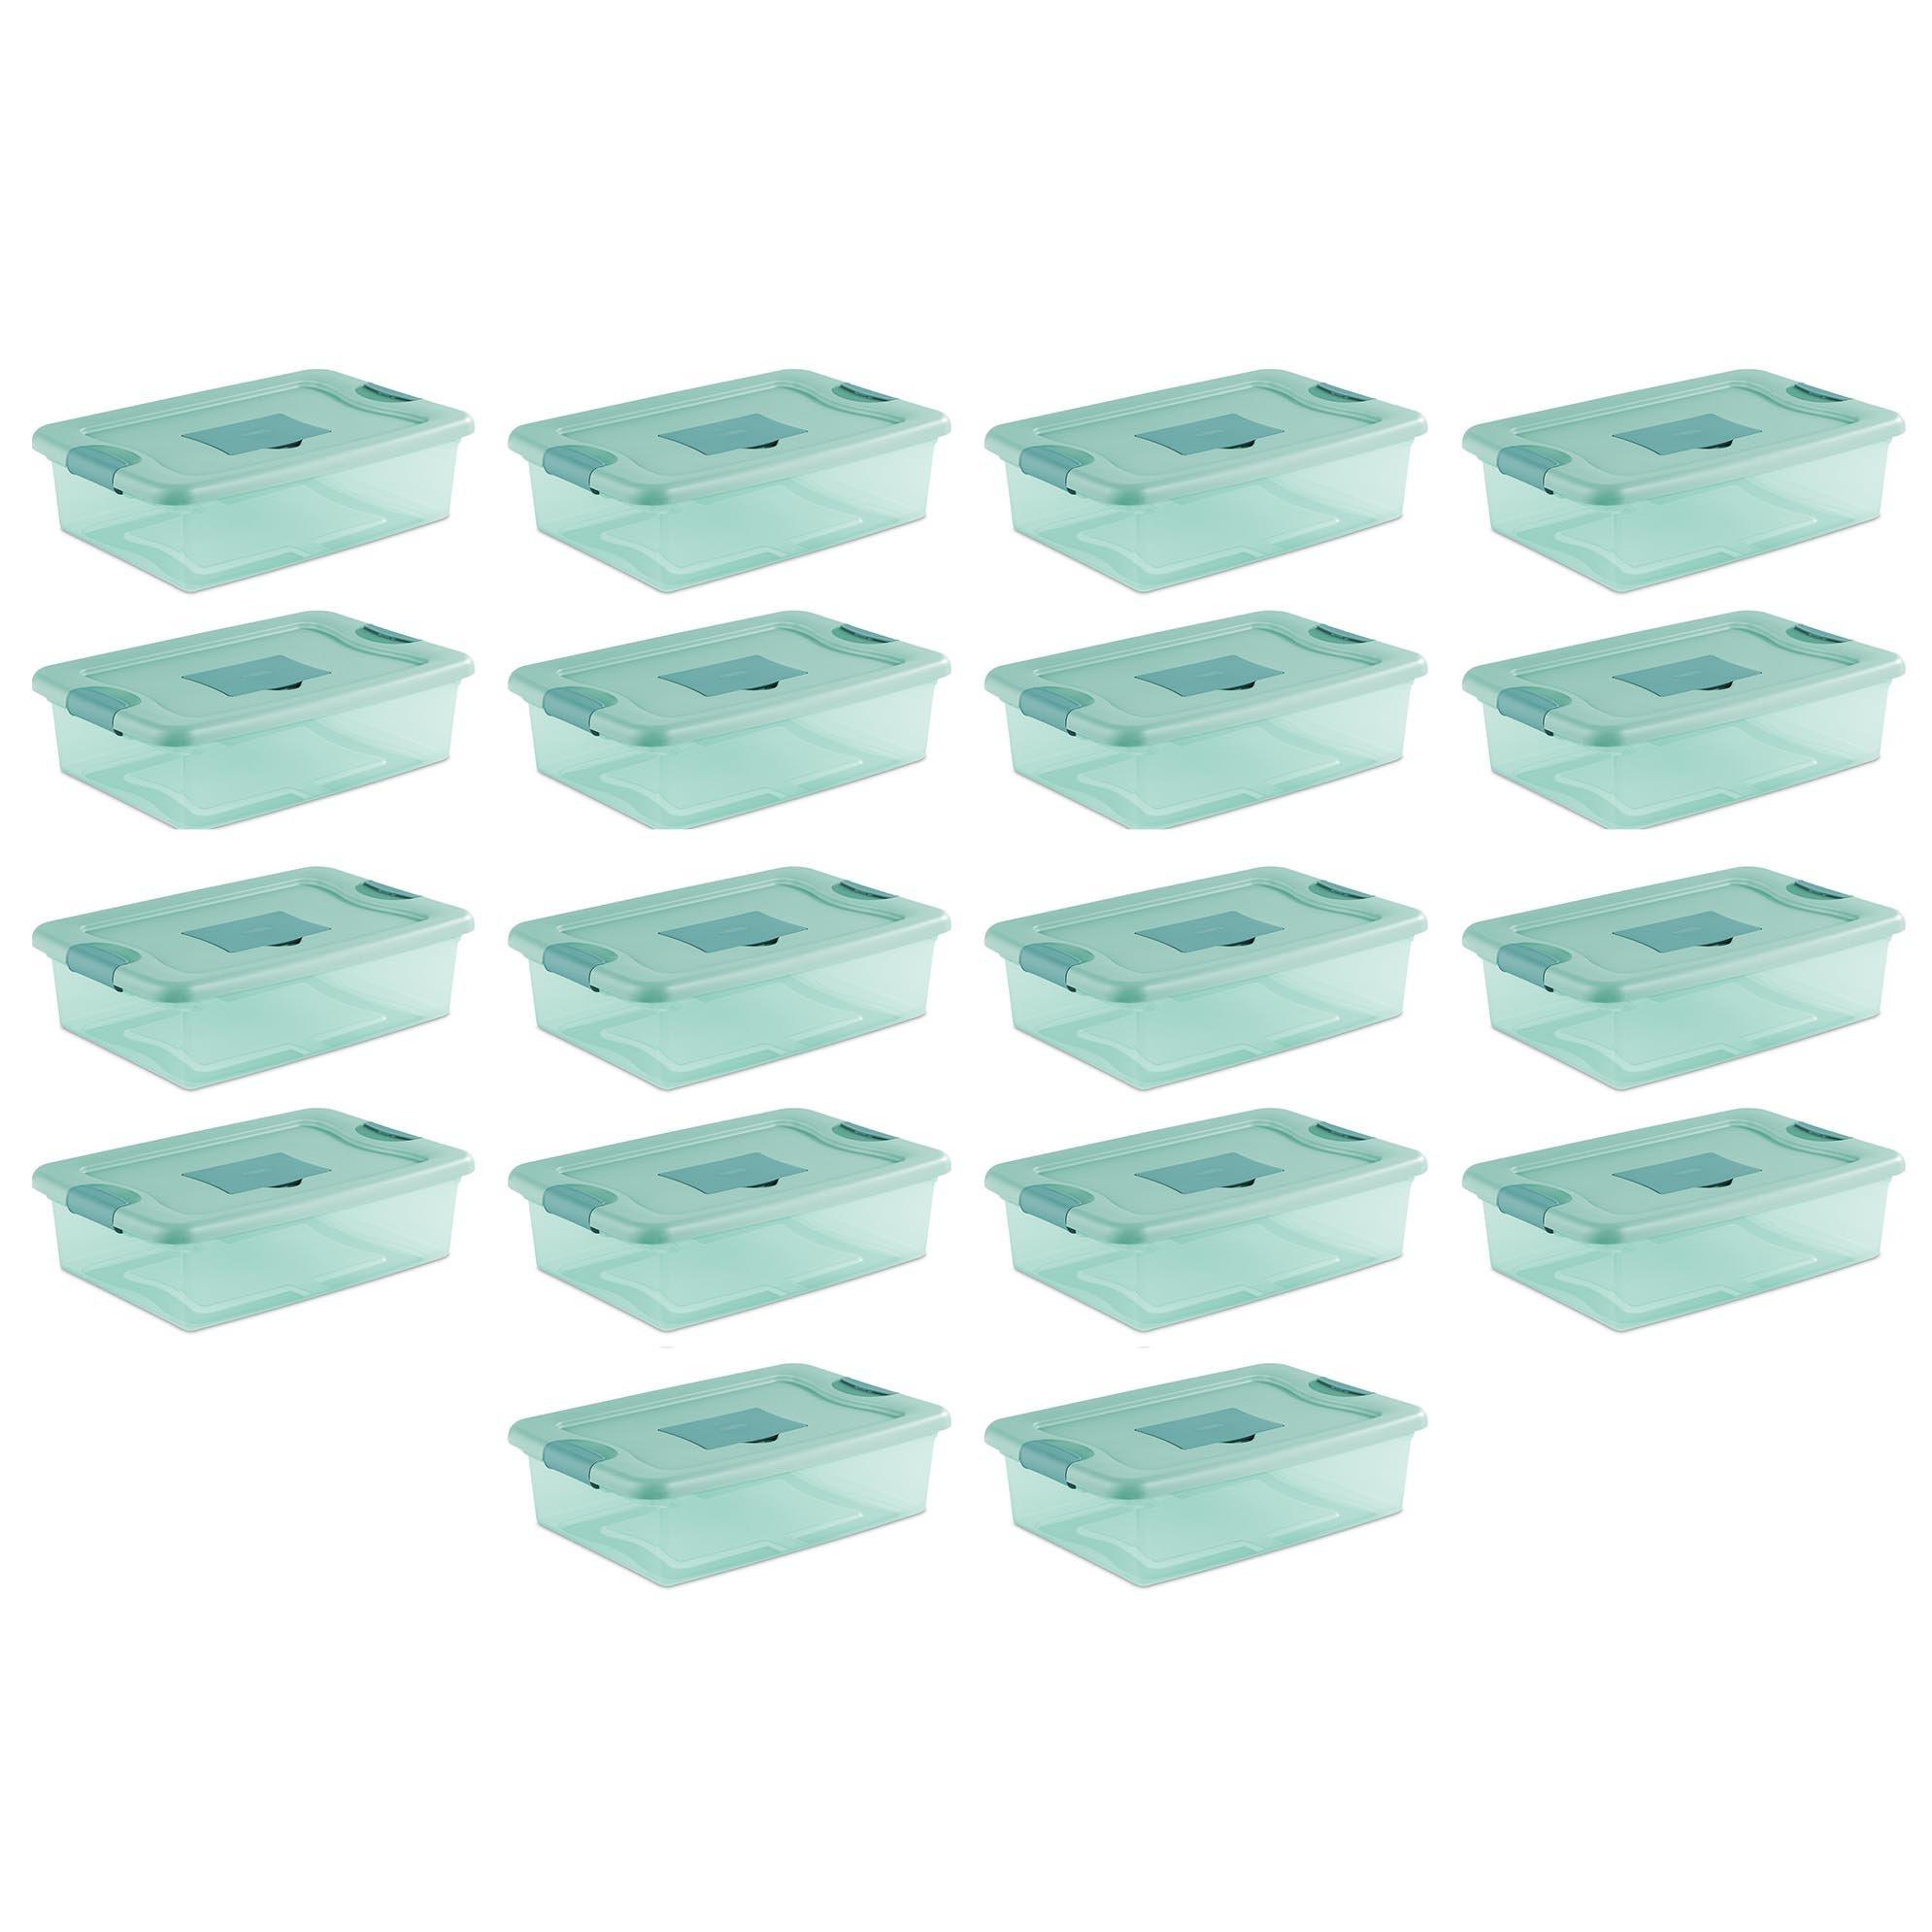 Sterilite 32 Quart Fresh Scent Stackable Plastic Storage Box Container (18 Pack)